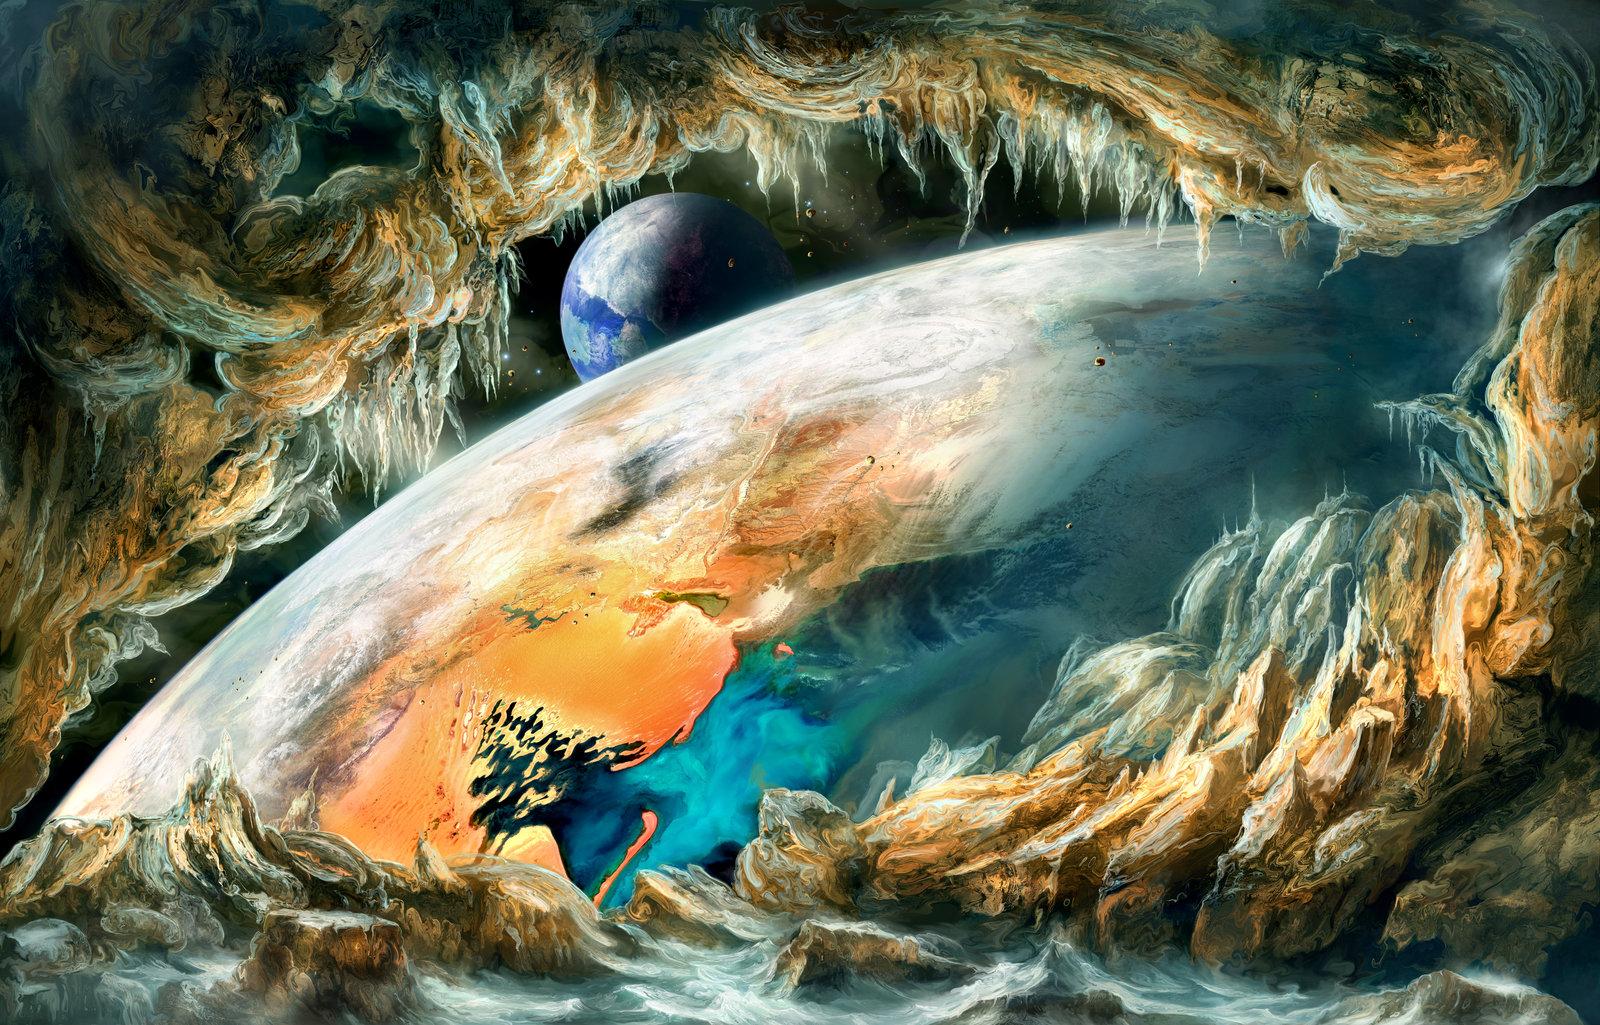 Cavern View of Desert Planet